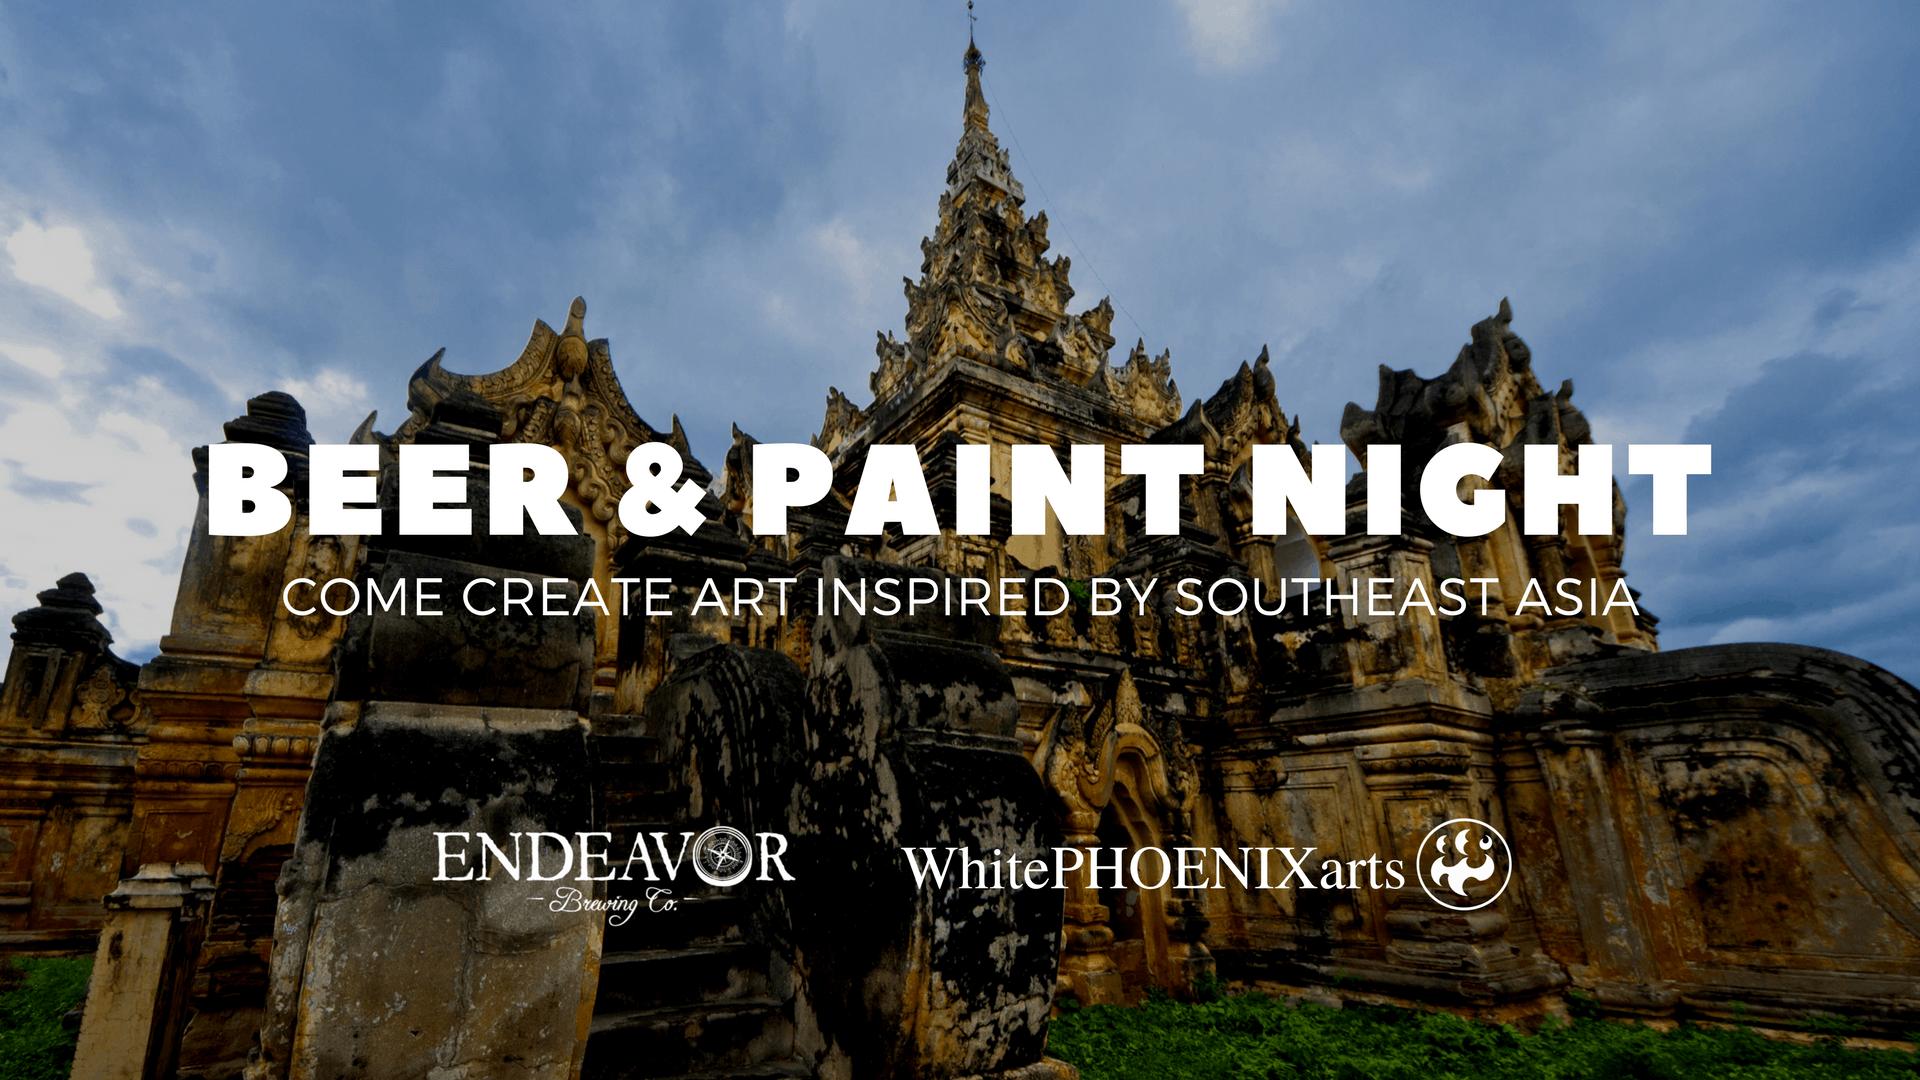 Beer & Paint Night